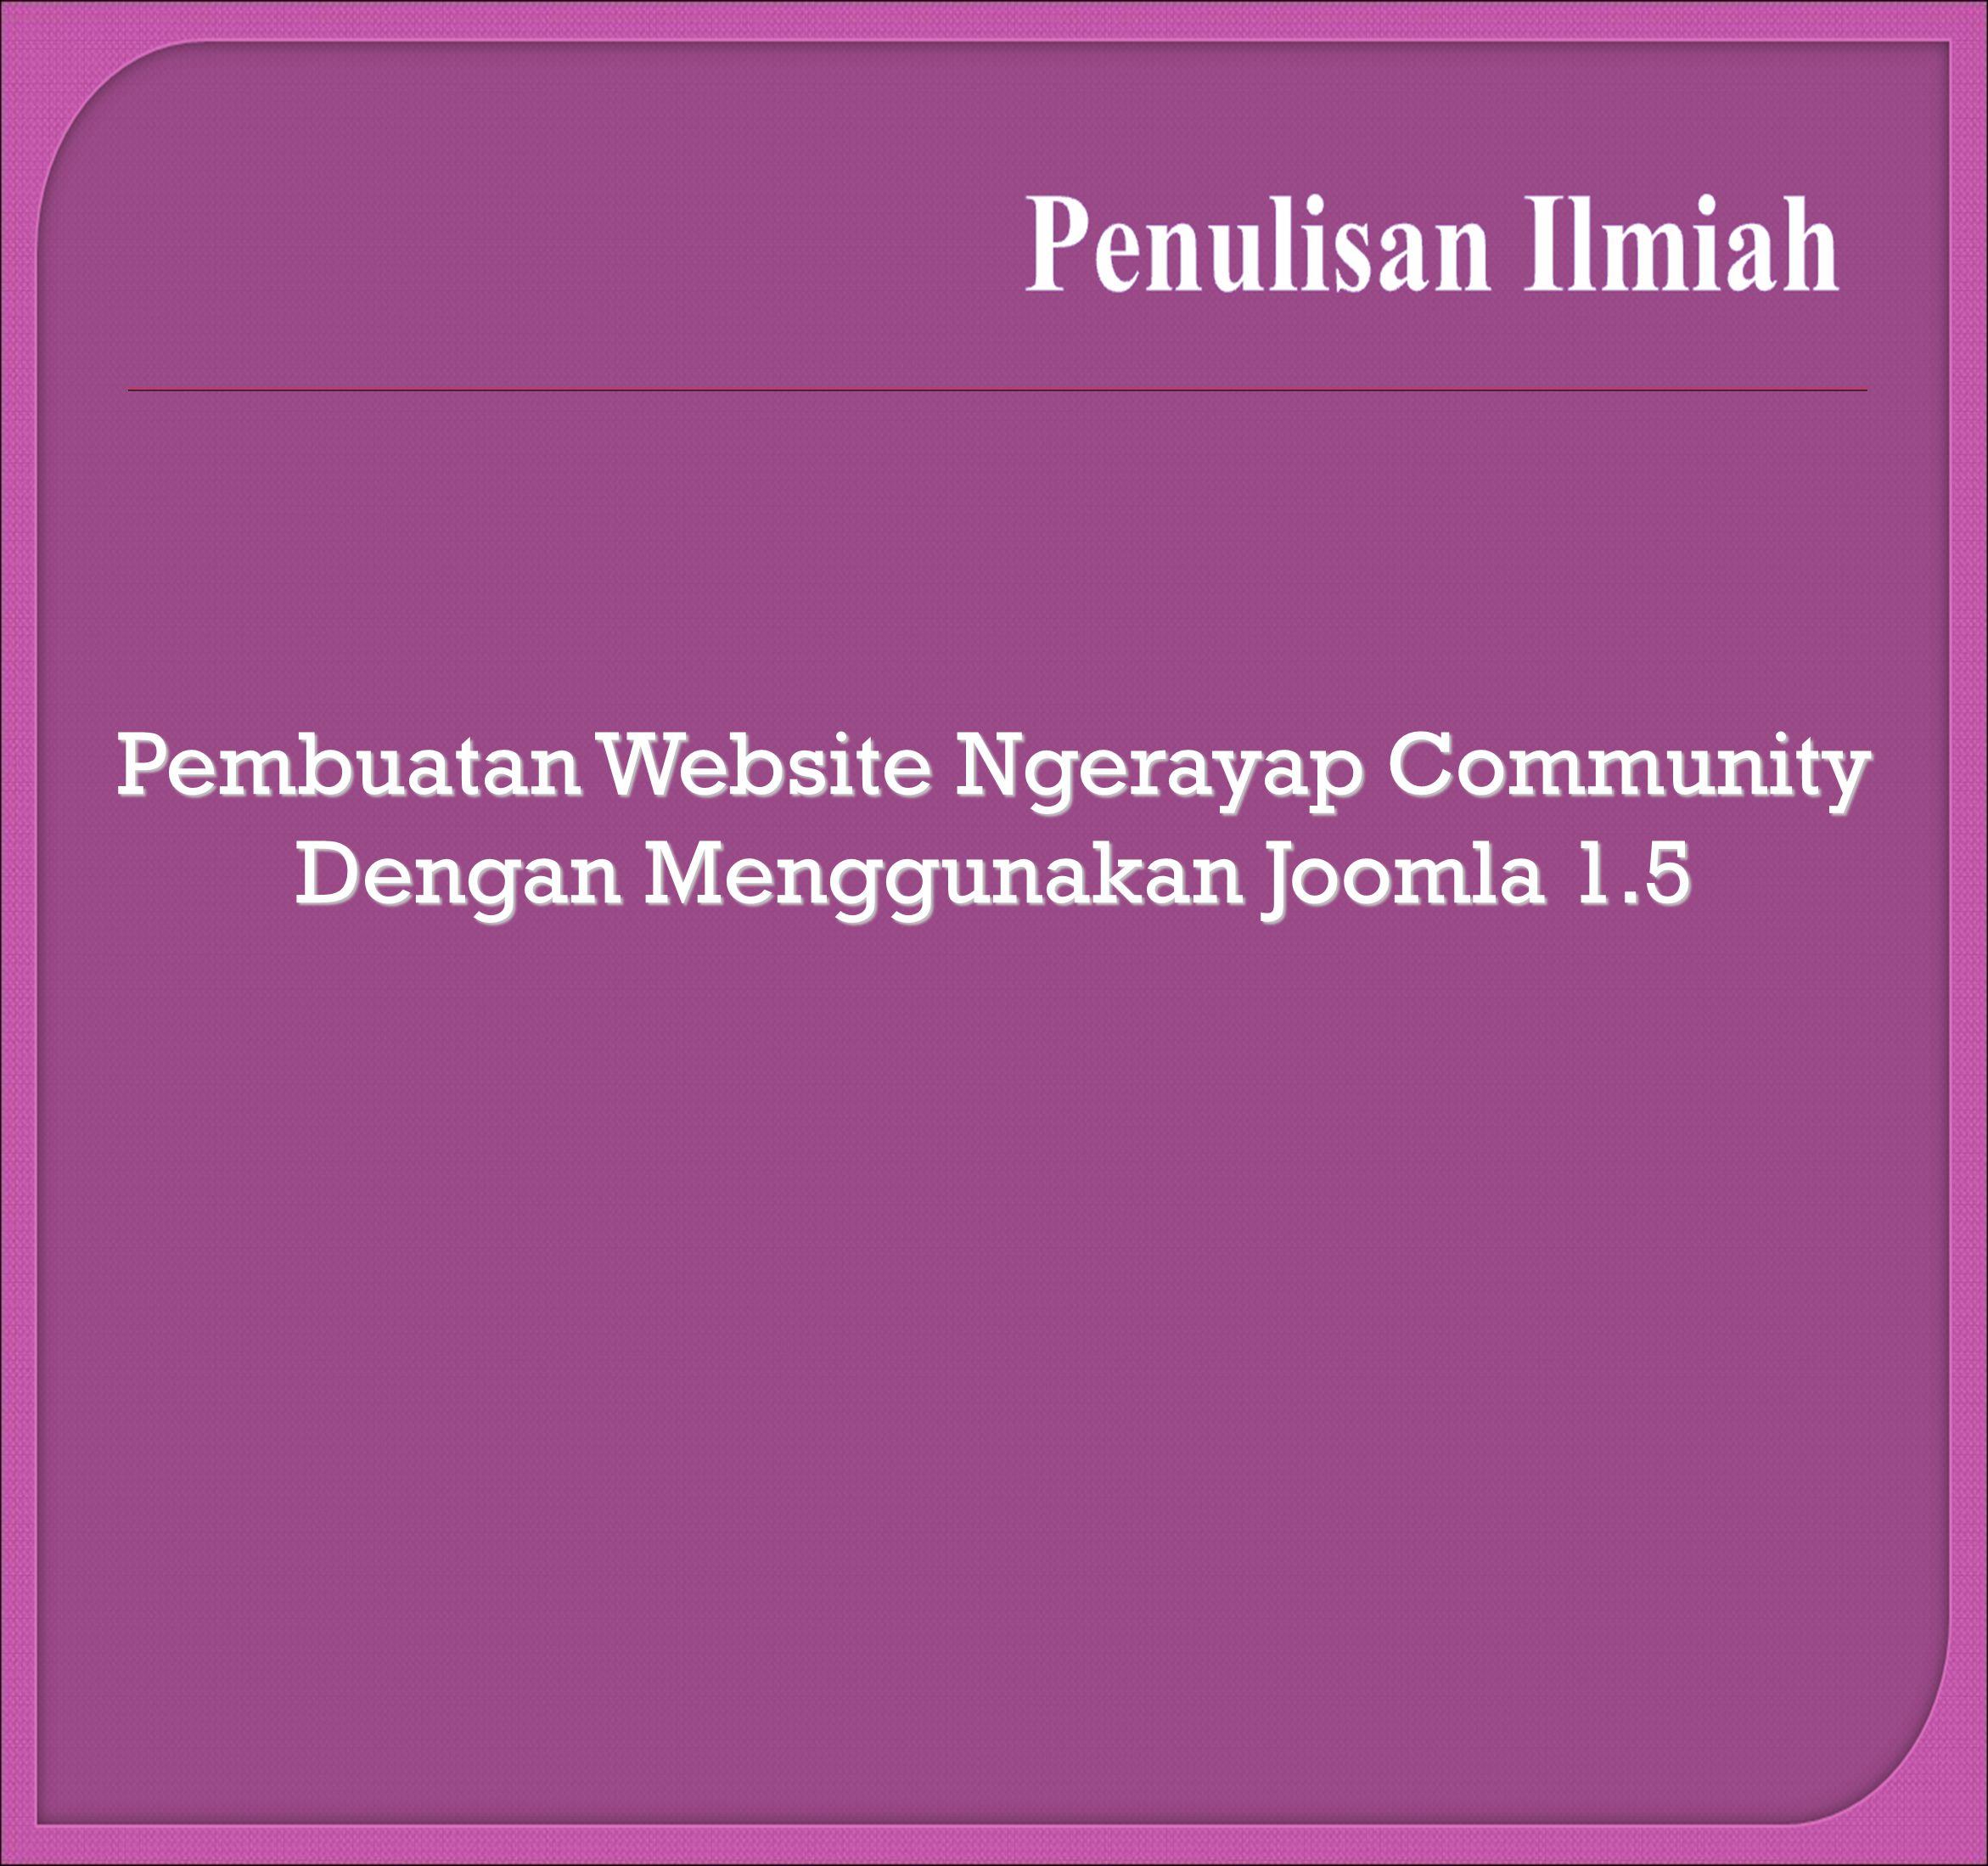 Pembuatan Website Ngerayap Community Dengan Menggunakan Joomla 1.5